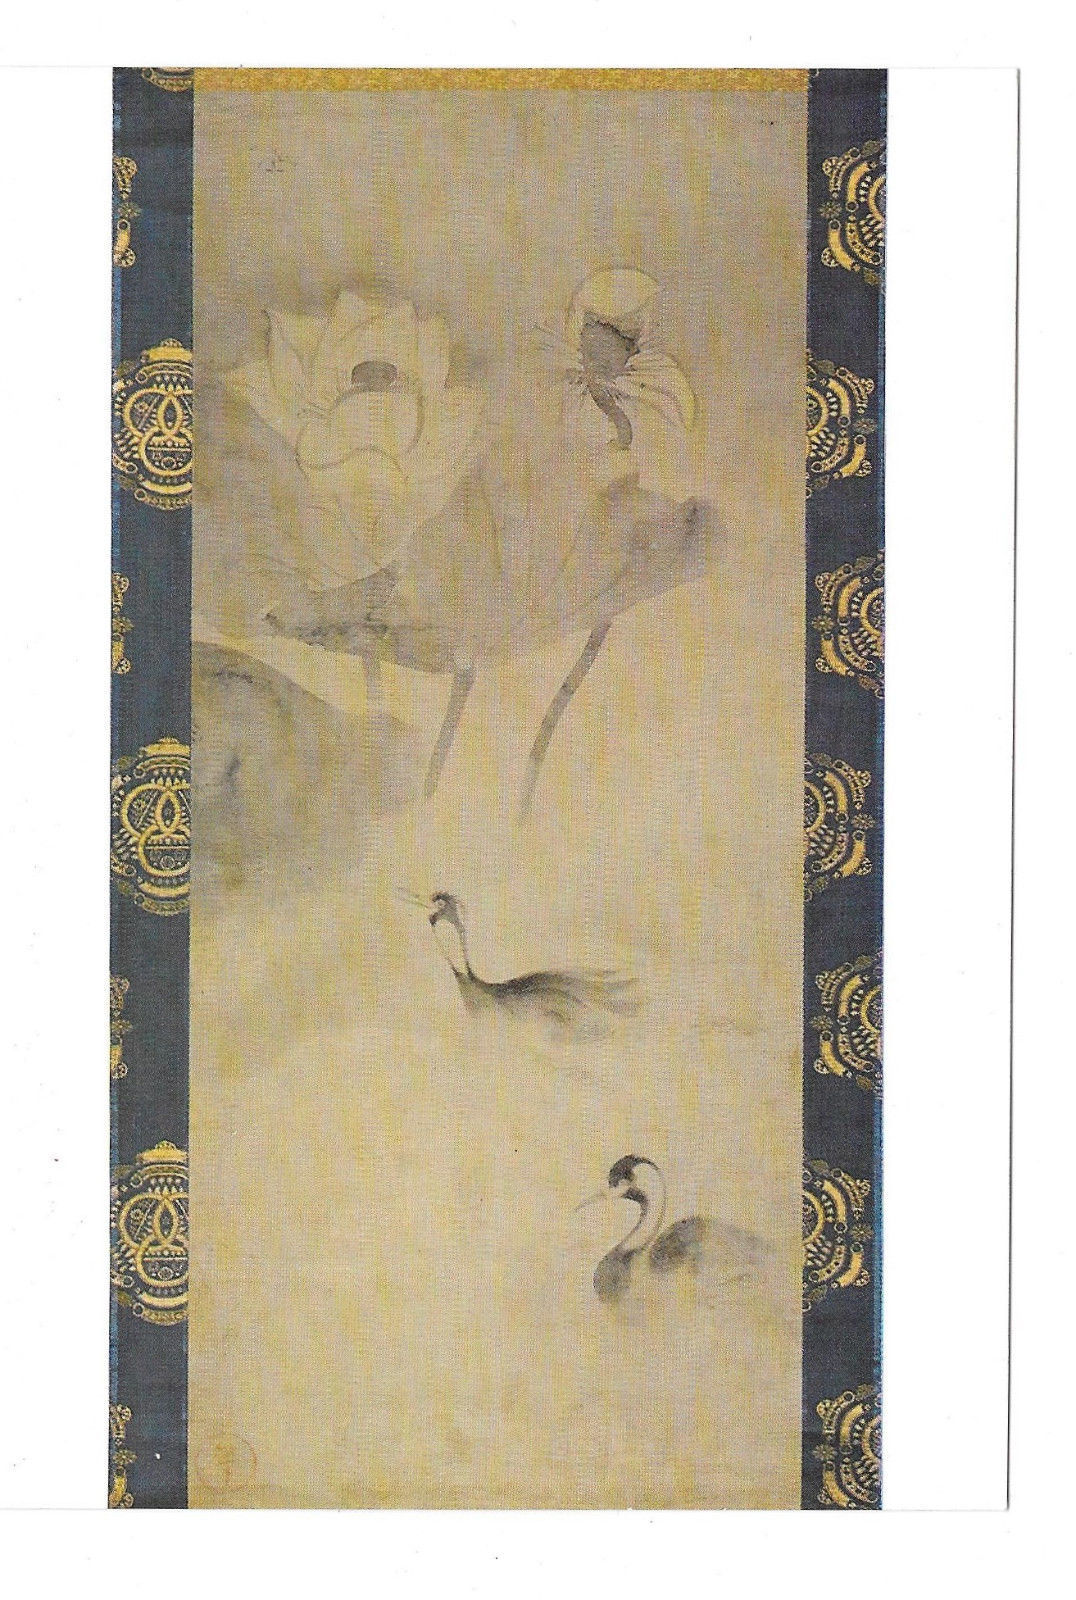 Japan Sotatsu Lotus Pond Swimming Birds Painting Vtg Art Postcard 4X6